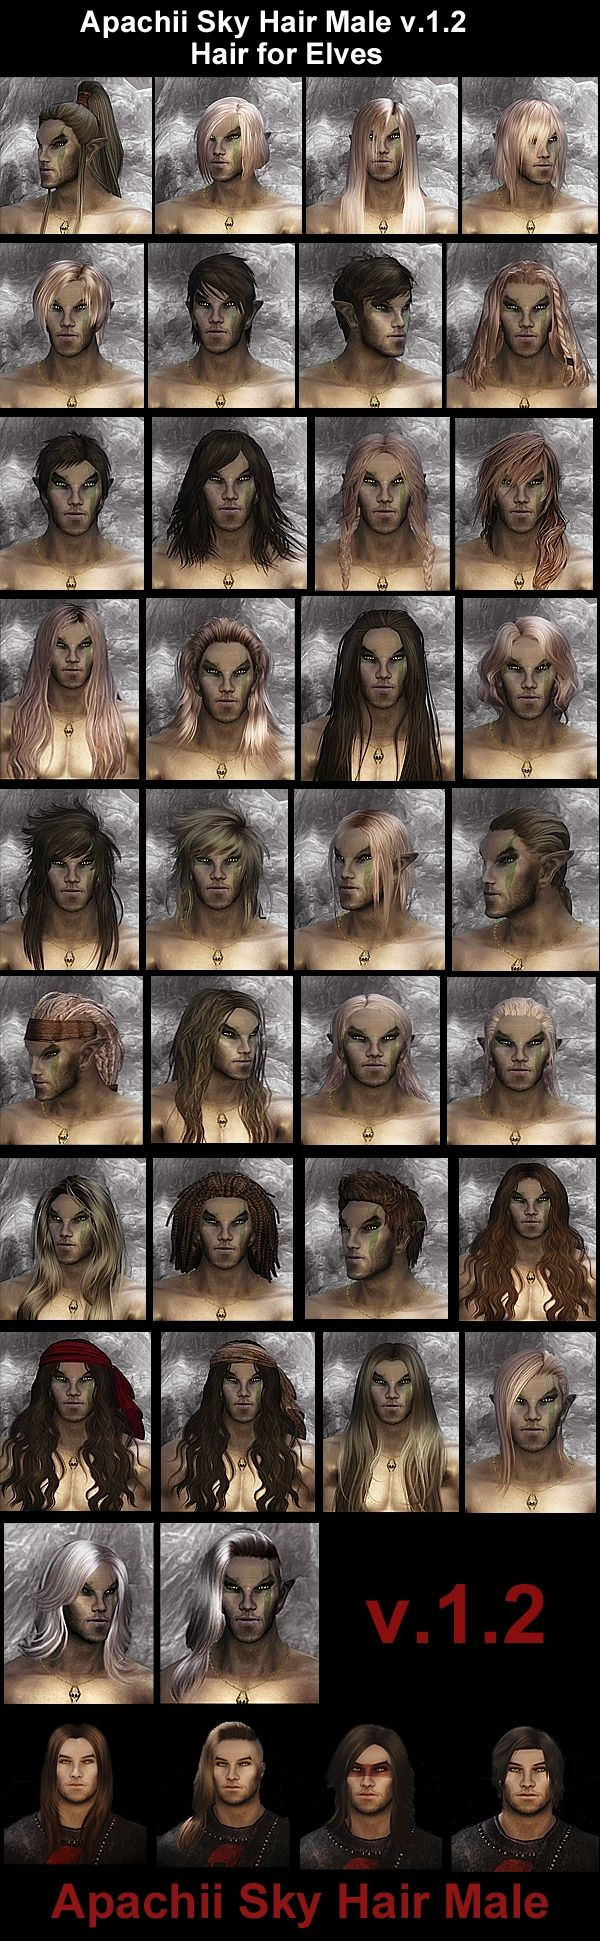 ApachiiSkyHair / Новые причёски от Апачи - Skyrim | ModGames.net